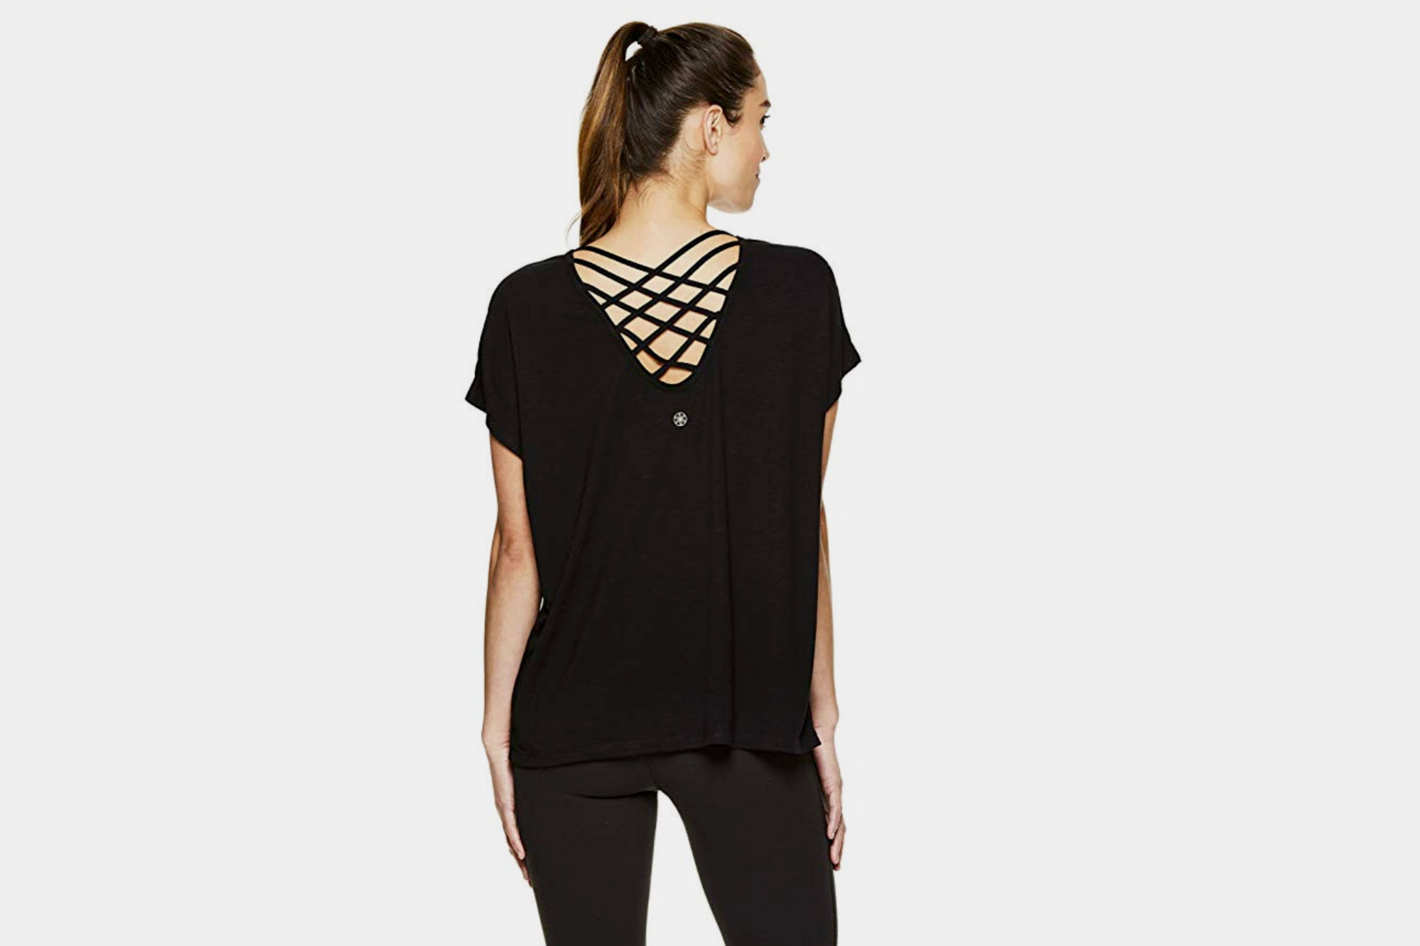 Gaiam Women's Short Sleeve Open Back Yoga T Shirt